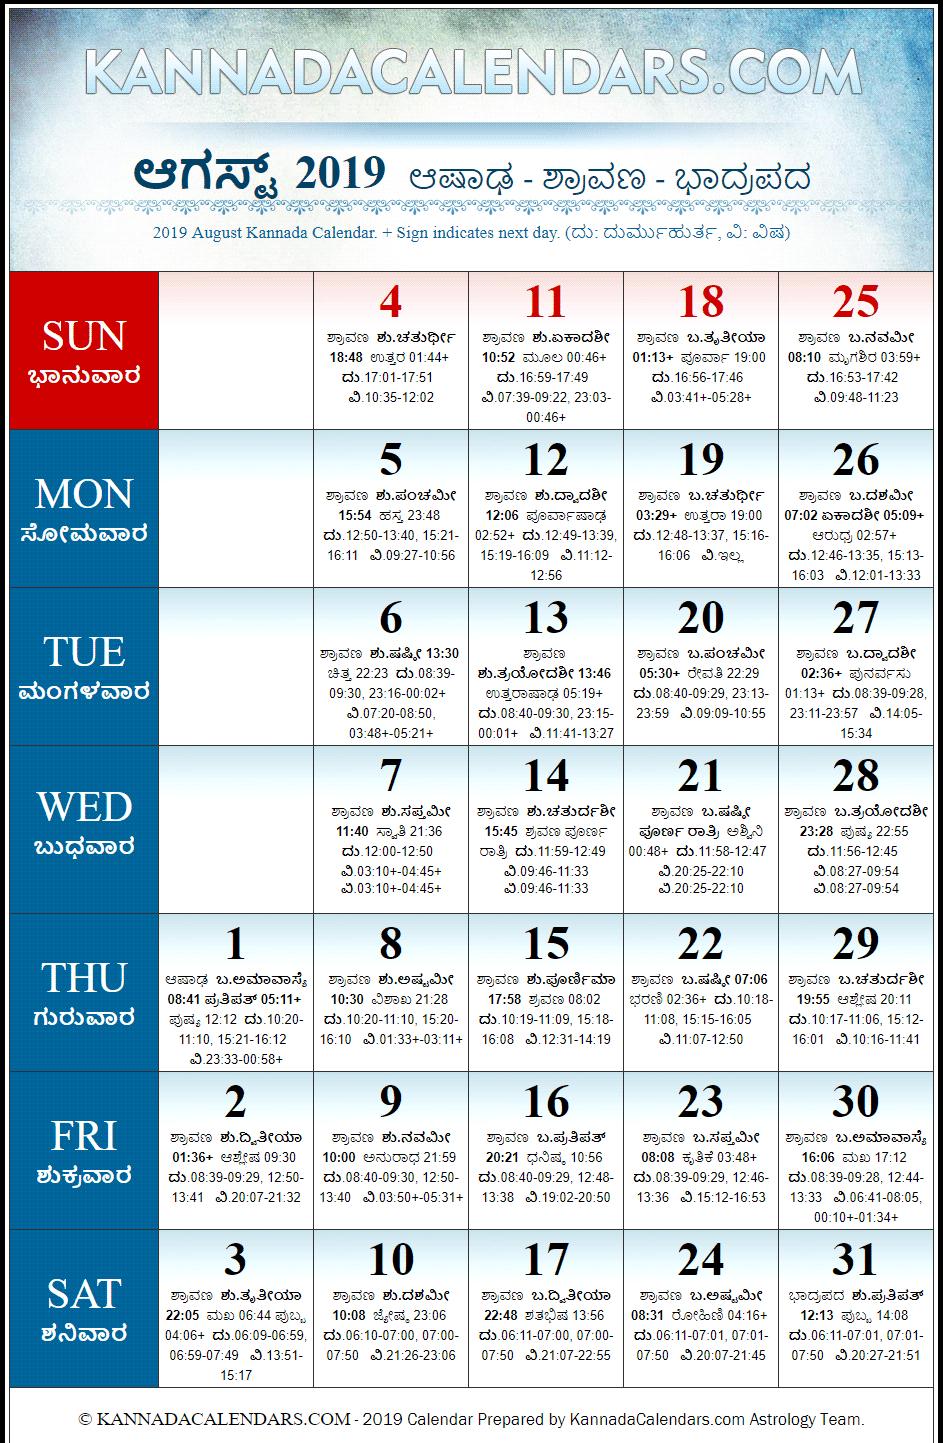 Kannada Calendar 2019 Pdf Free Download pertaining to Kannada Calendar 2020 August